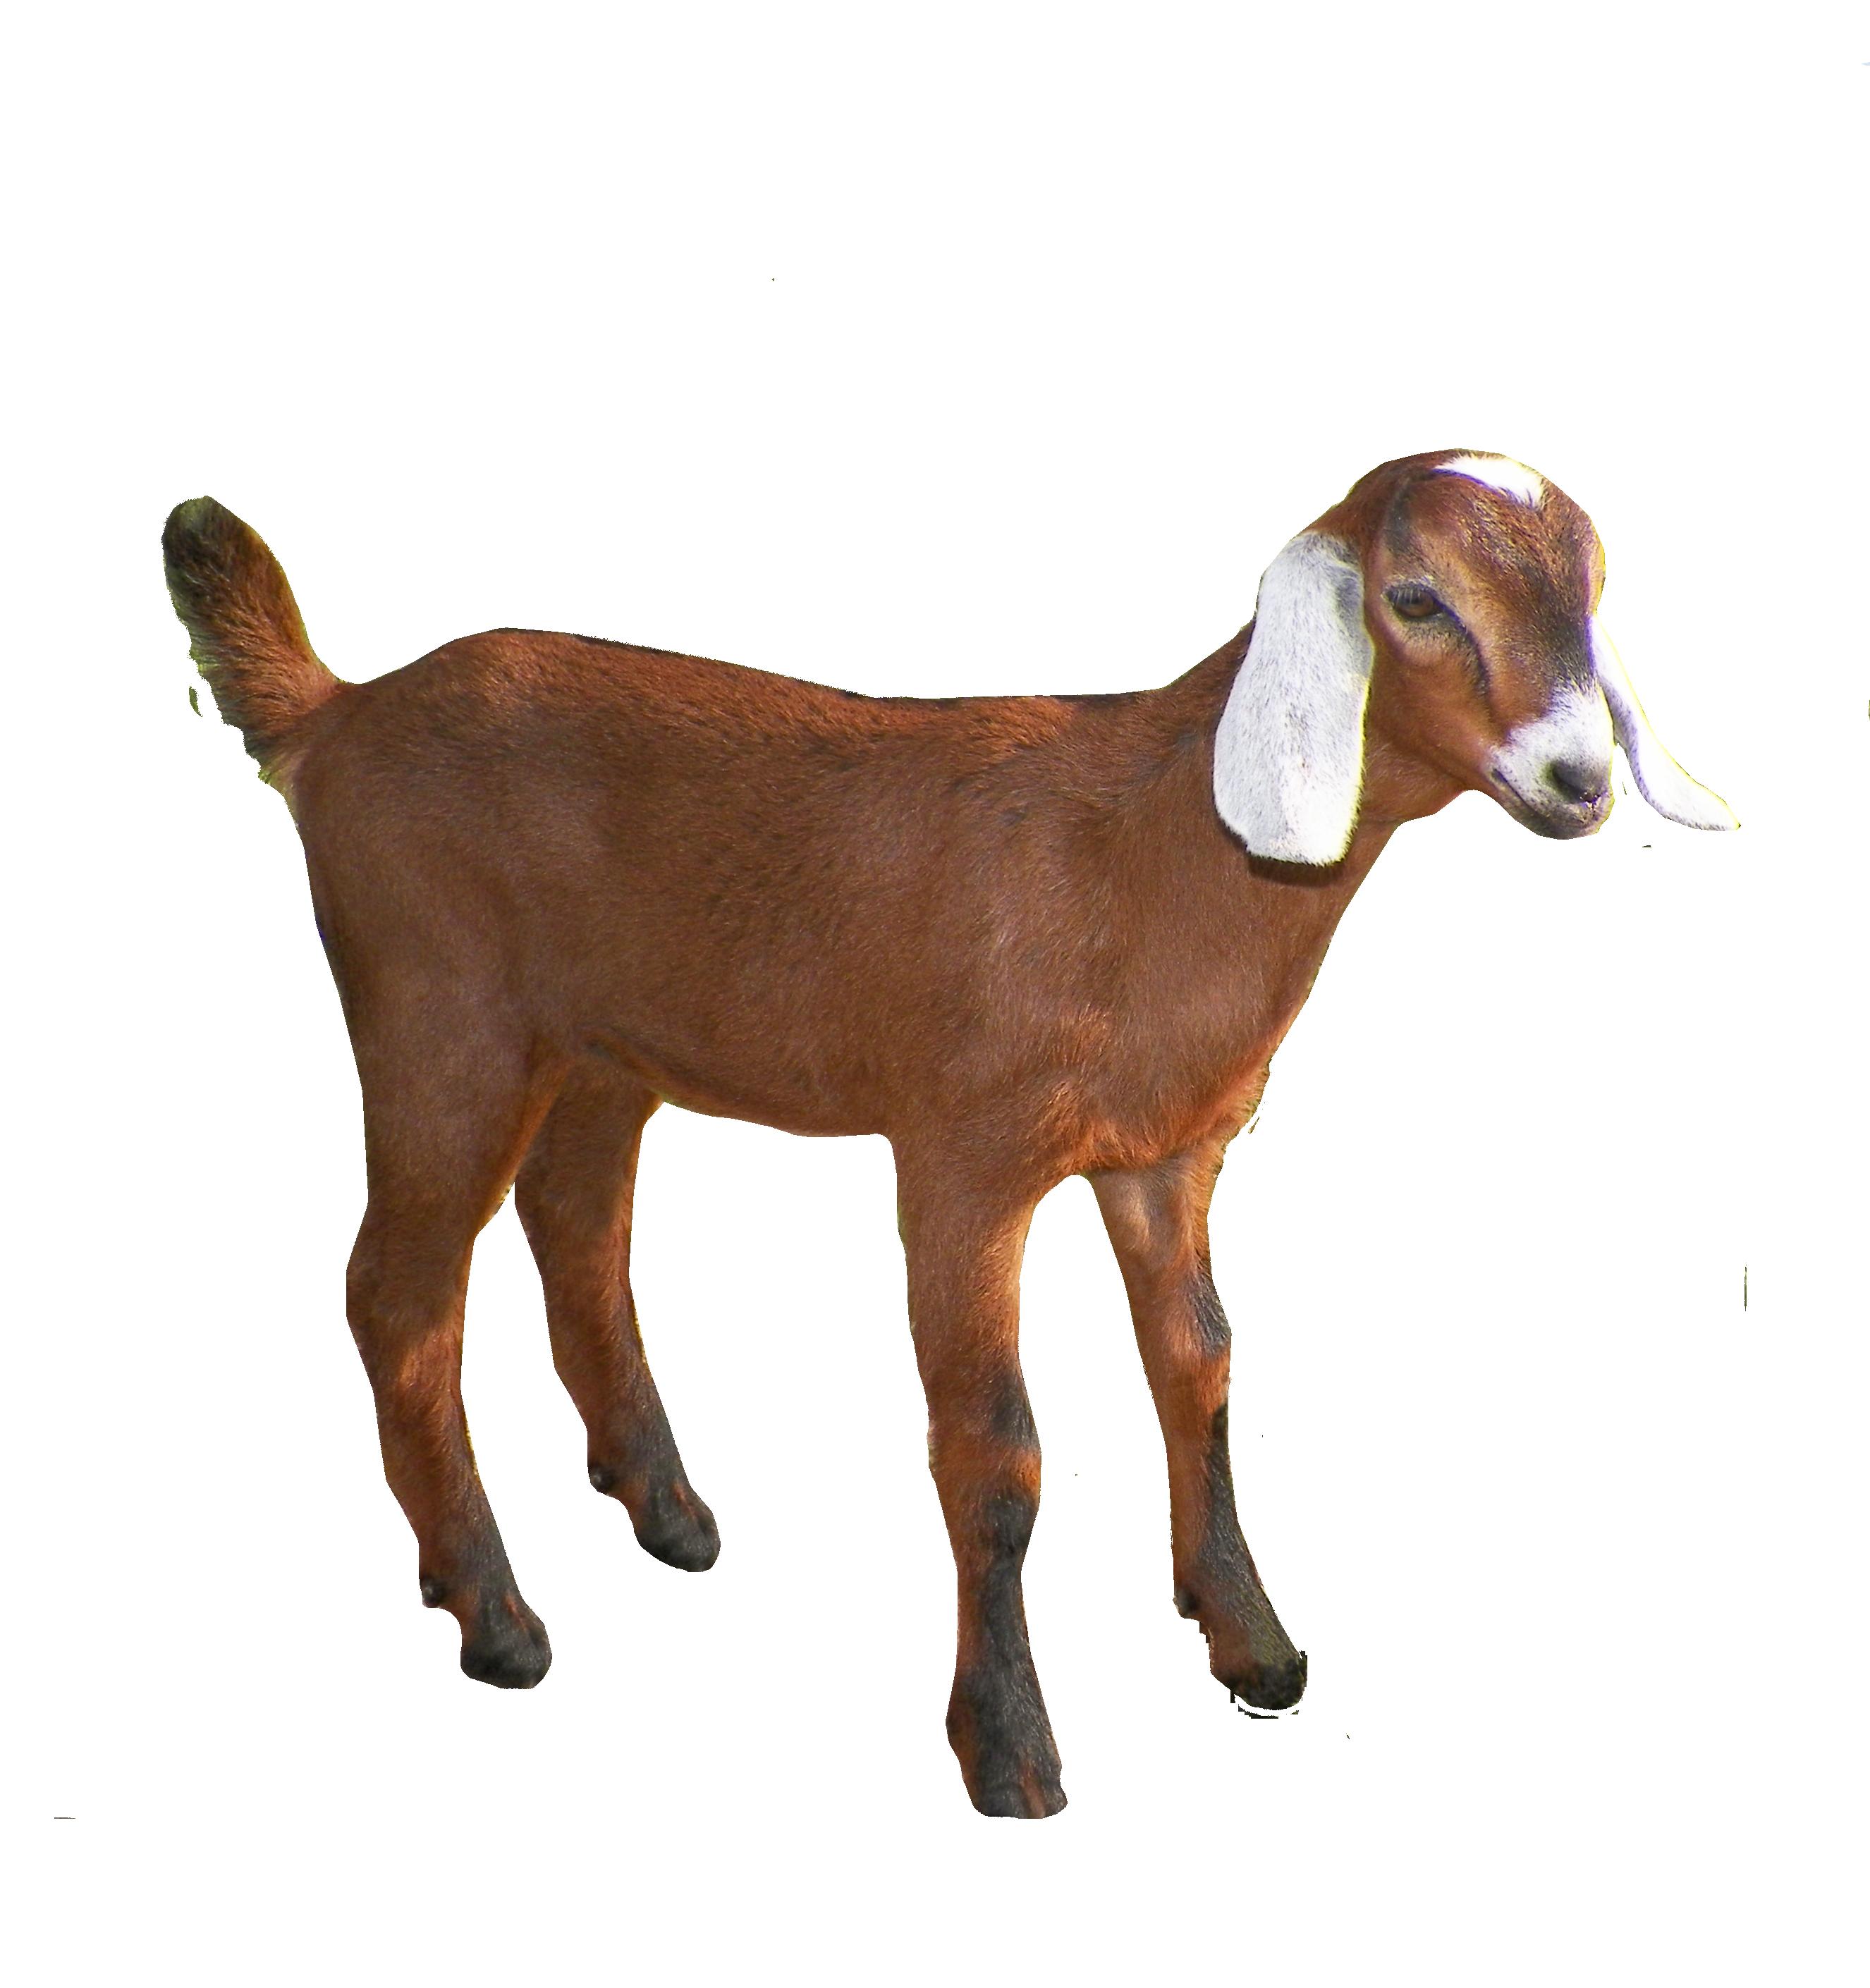 Goat Png - Goat, Transparent background PNG HD thumbnail